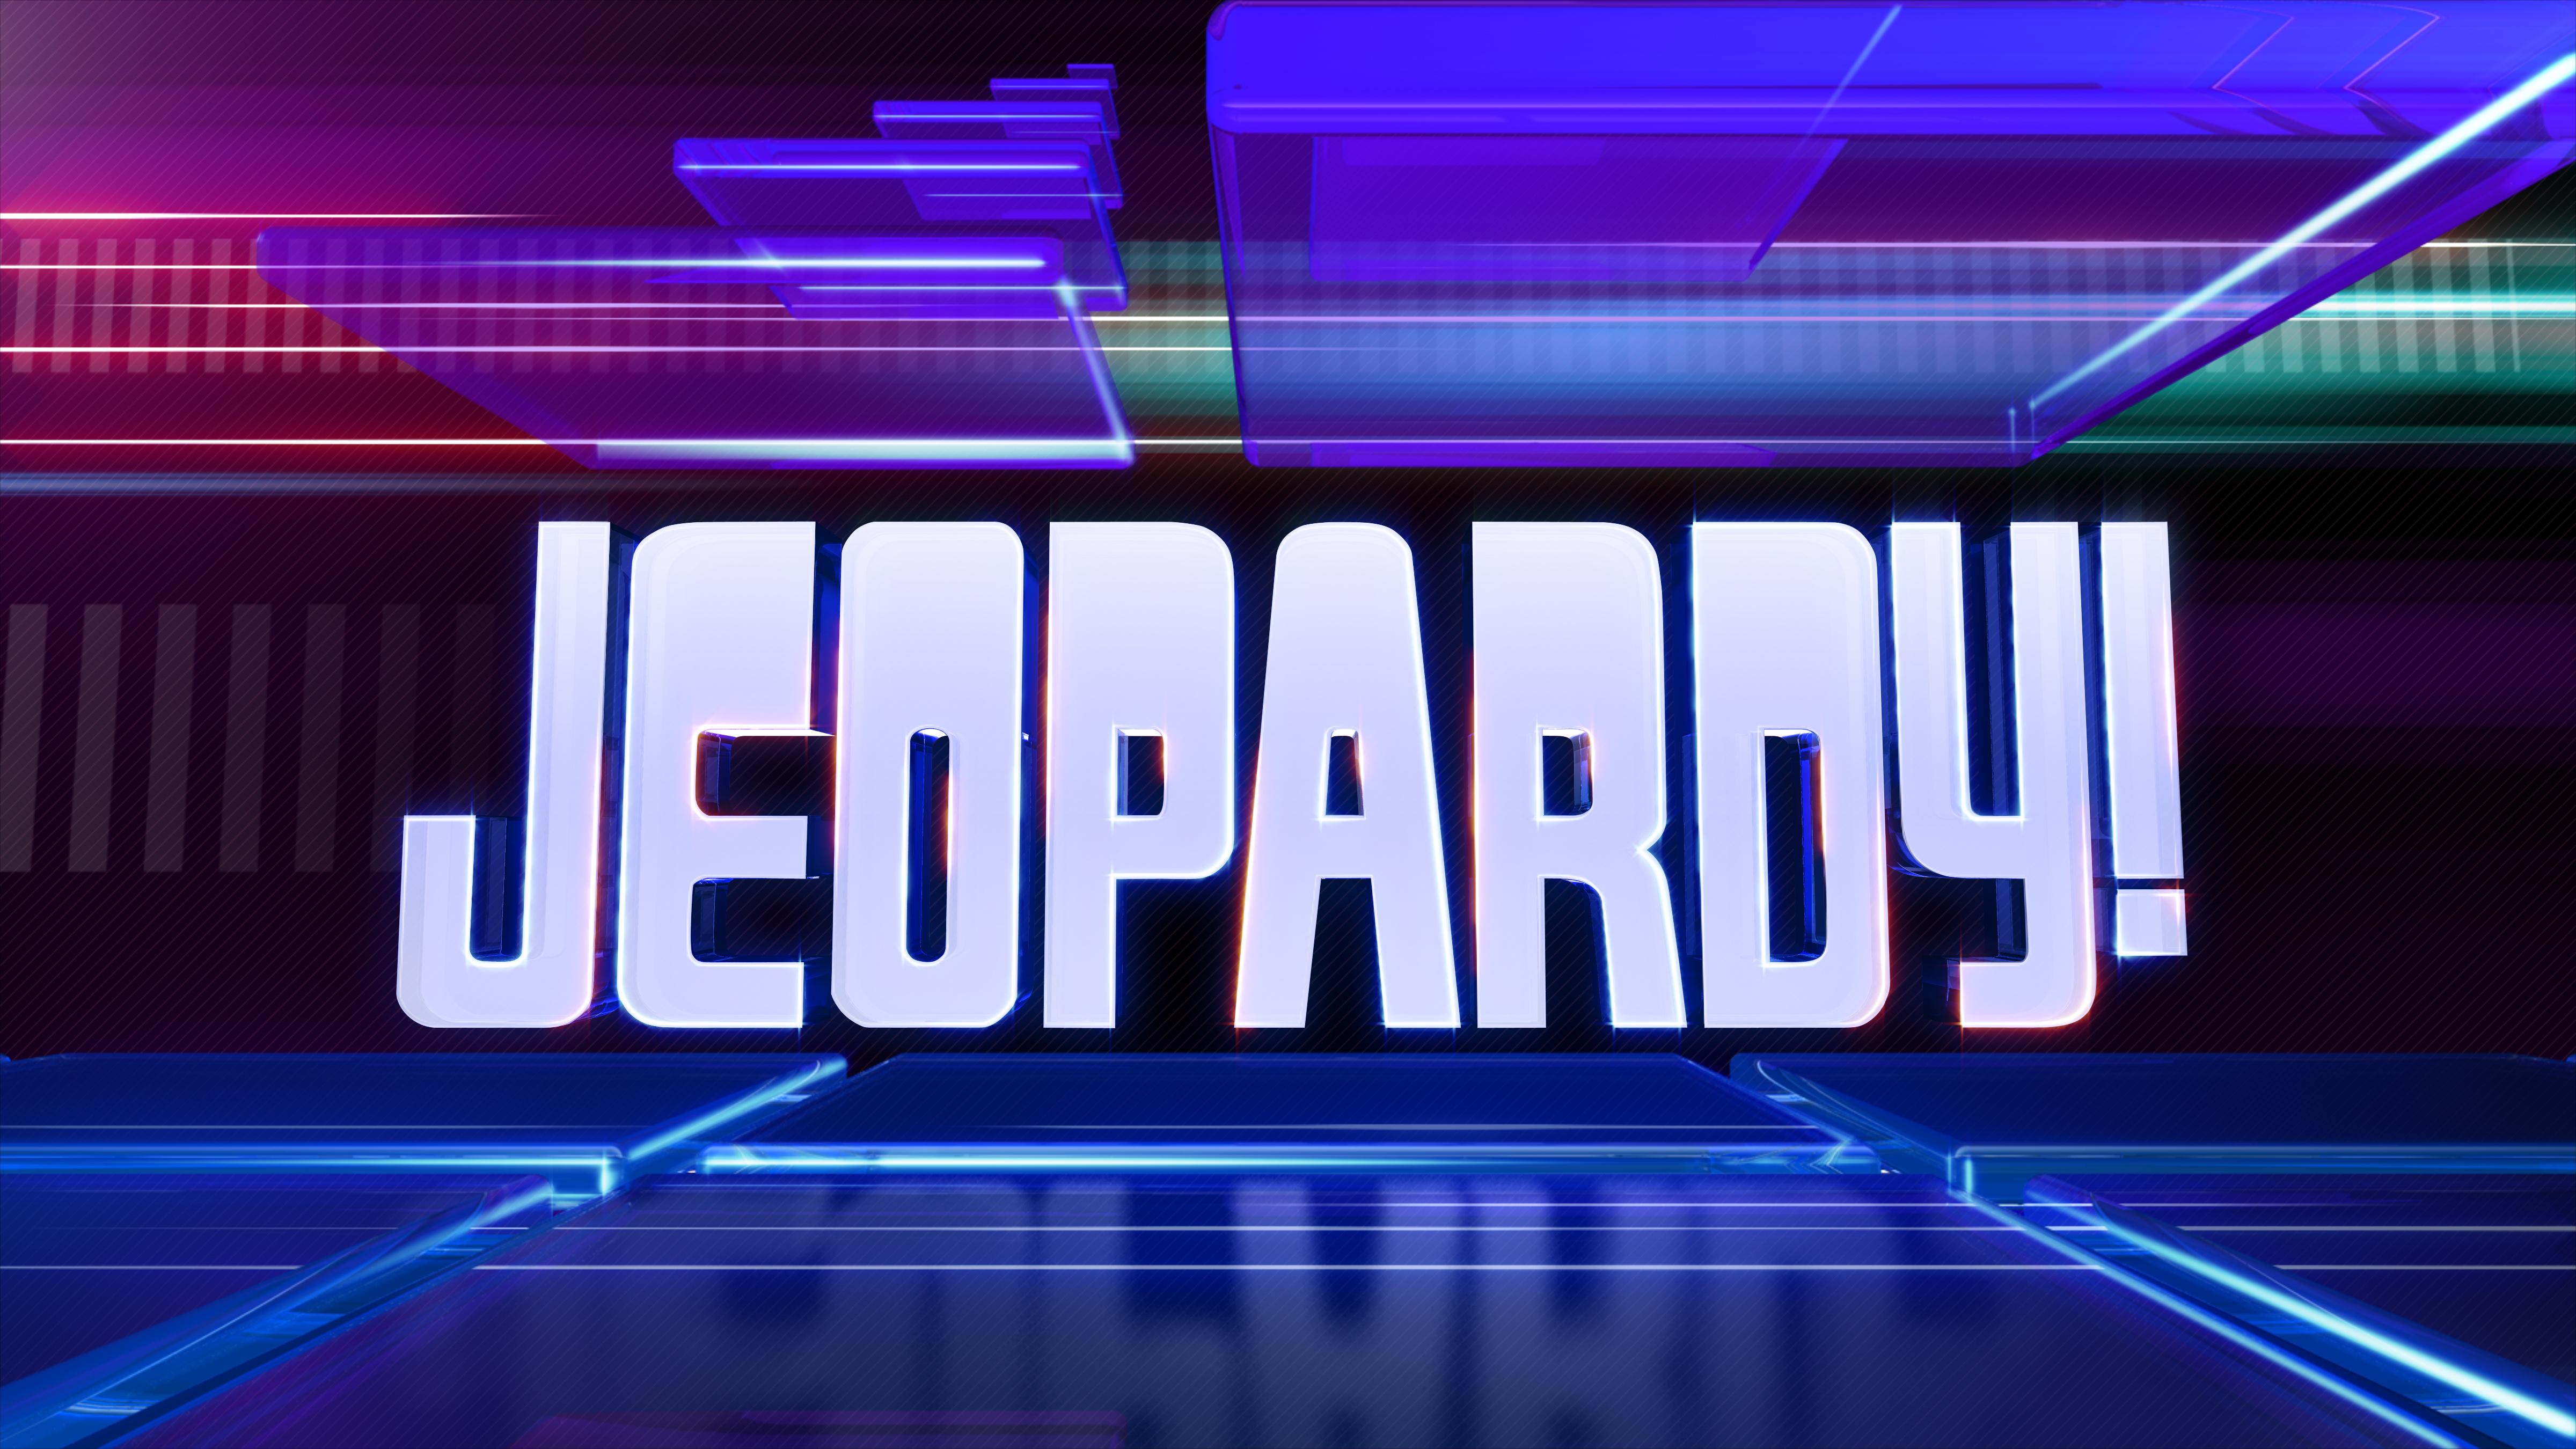 http://images.performgroup.com/di/library/sporting_news/1d/4e/jeopardy-logo_yaprse3dr5jo1ff2j7qizvo2p.jpg?t=-1206134380